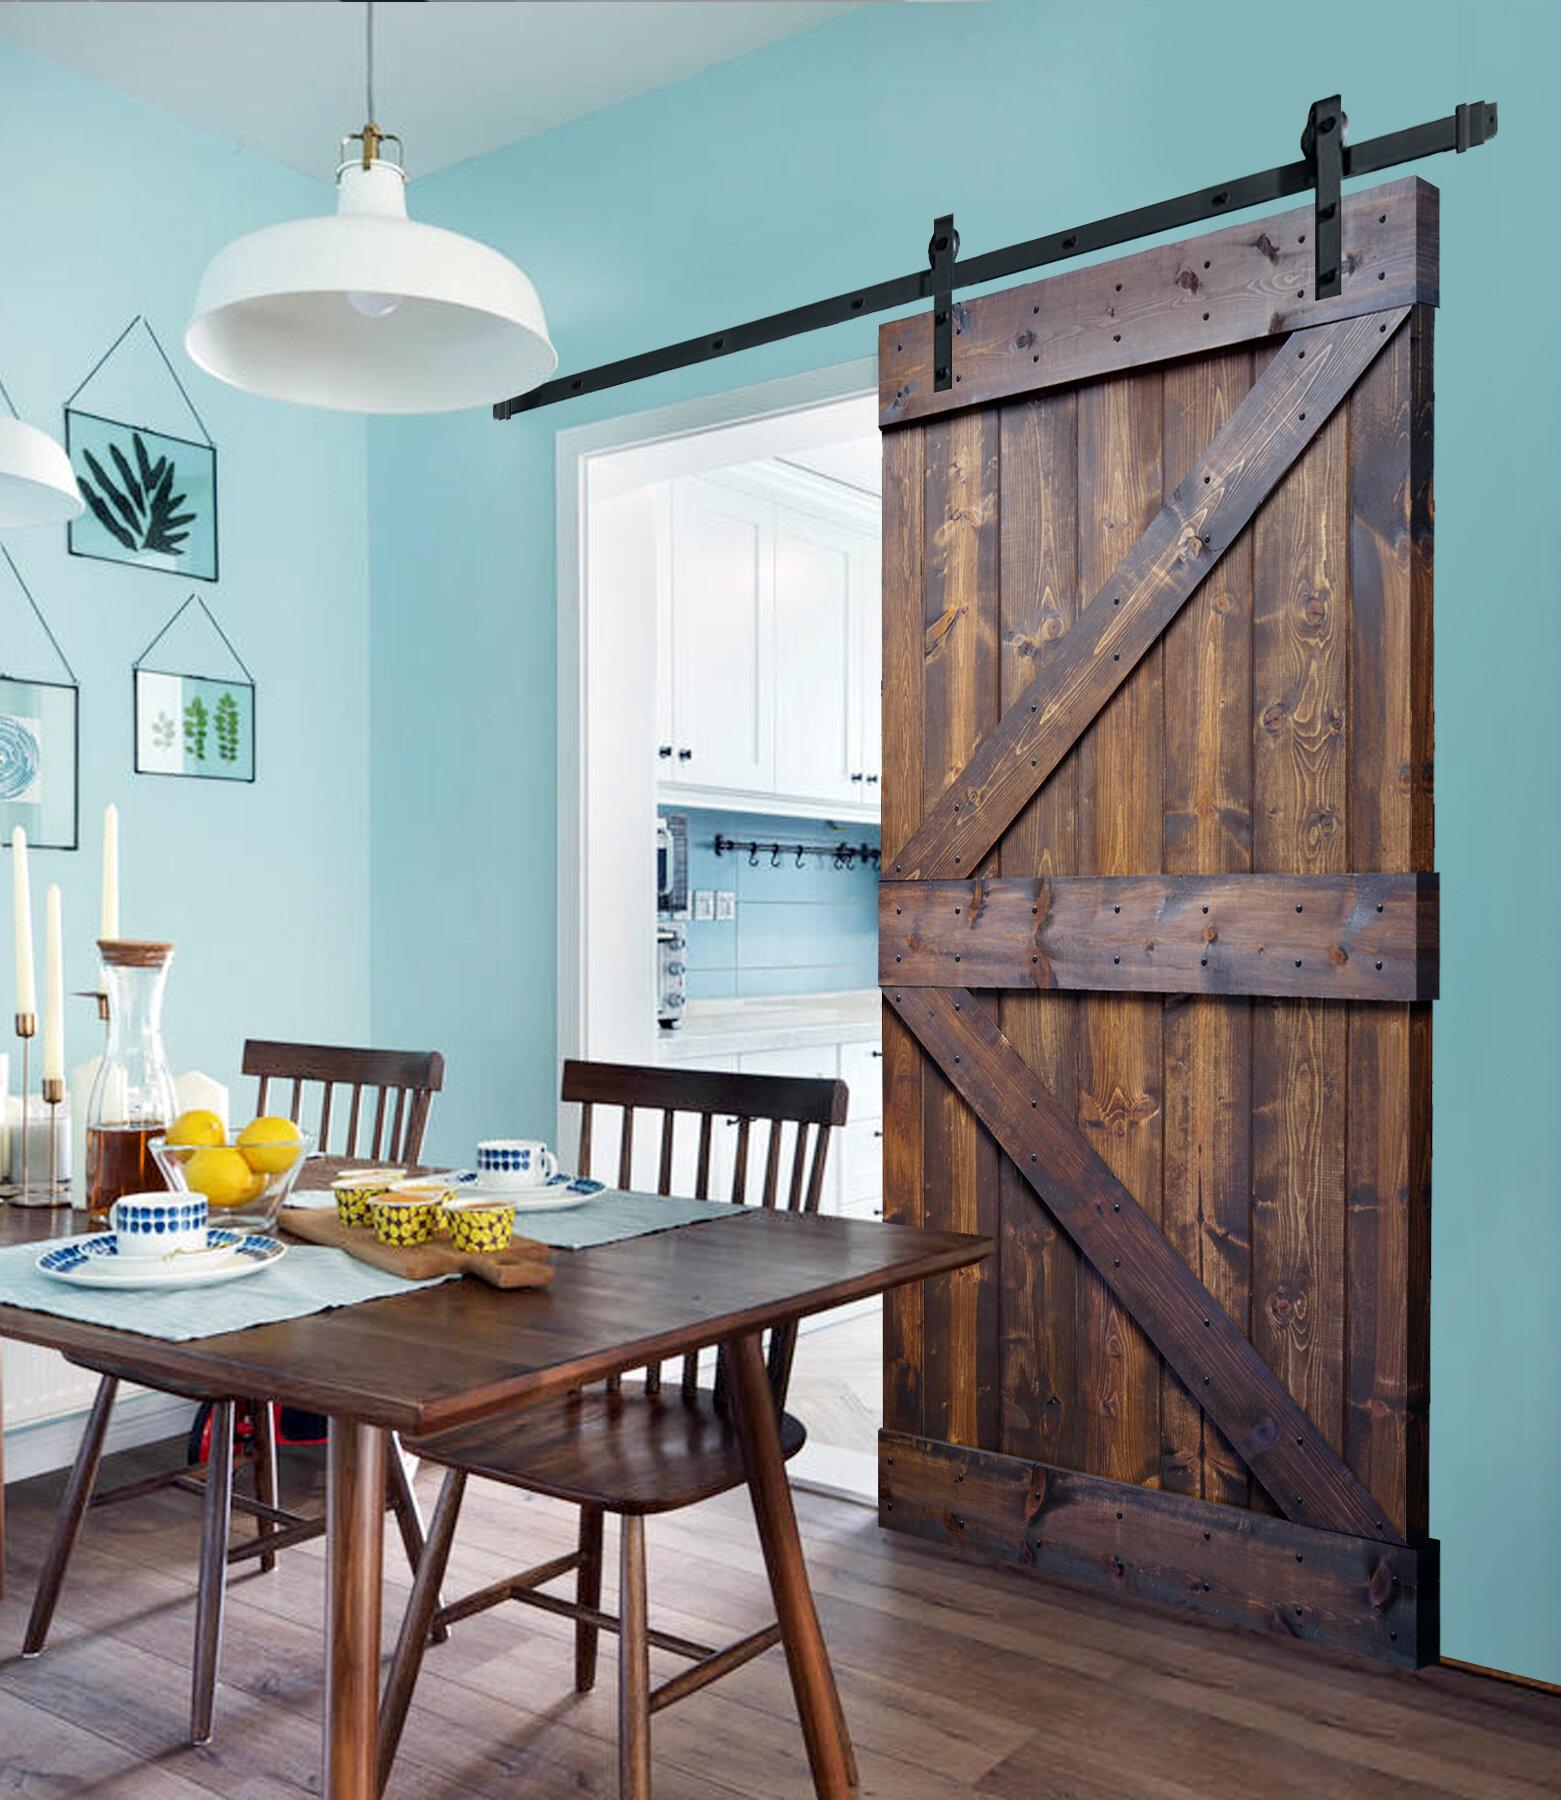 Paneled Wood Painted K Series Diy Sliding Barn Door Without Installation Hardware Kit